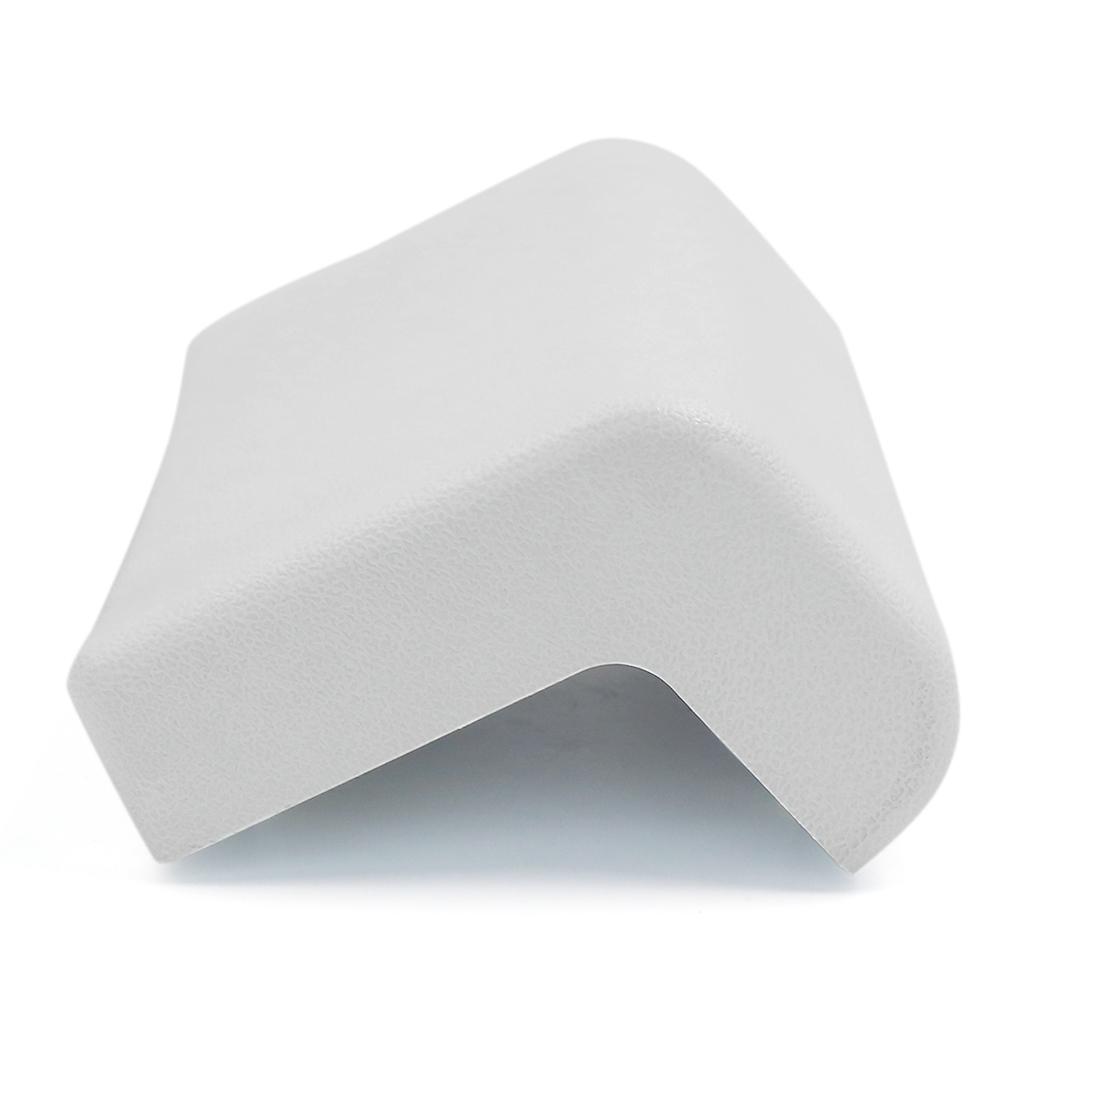 Waterproof Bath Pillow Non-Slip Headrest Shoulder Sponge